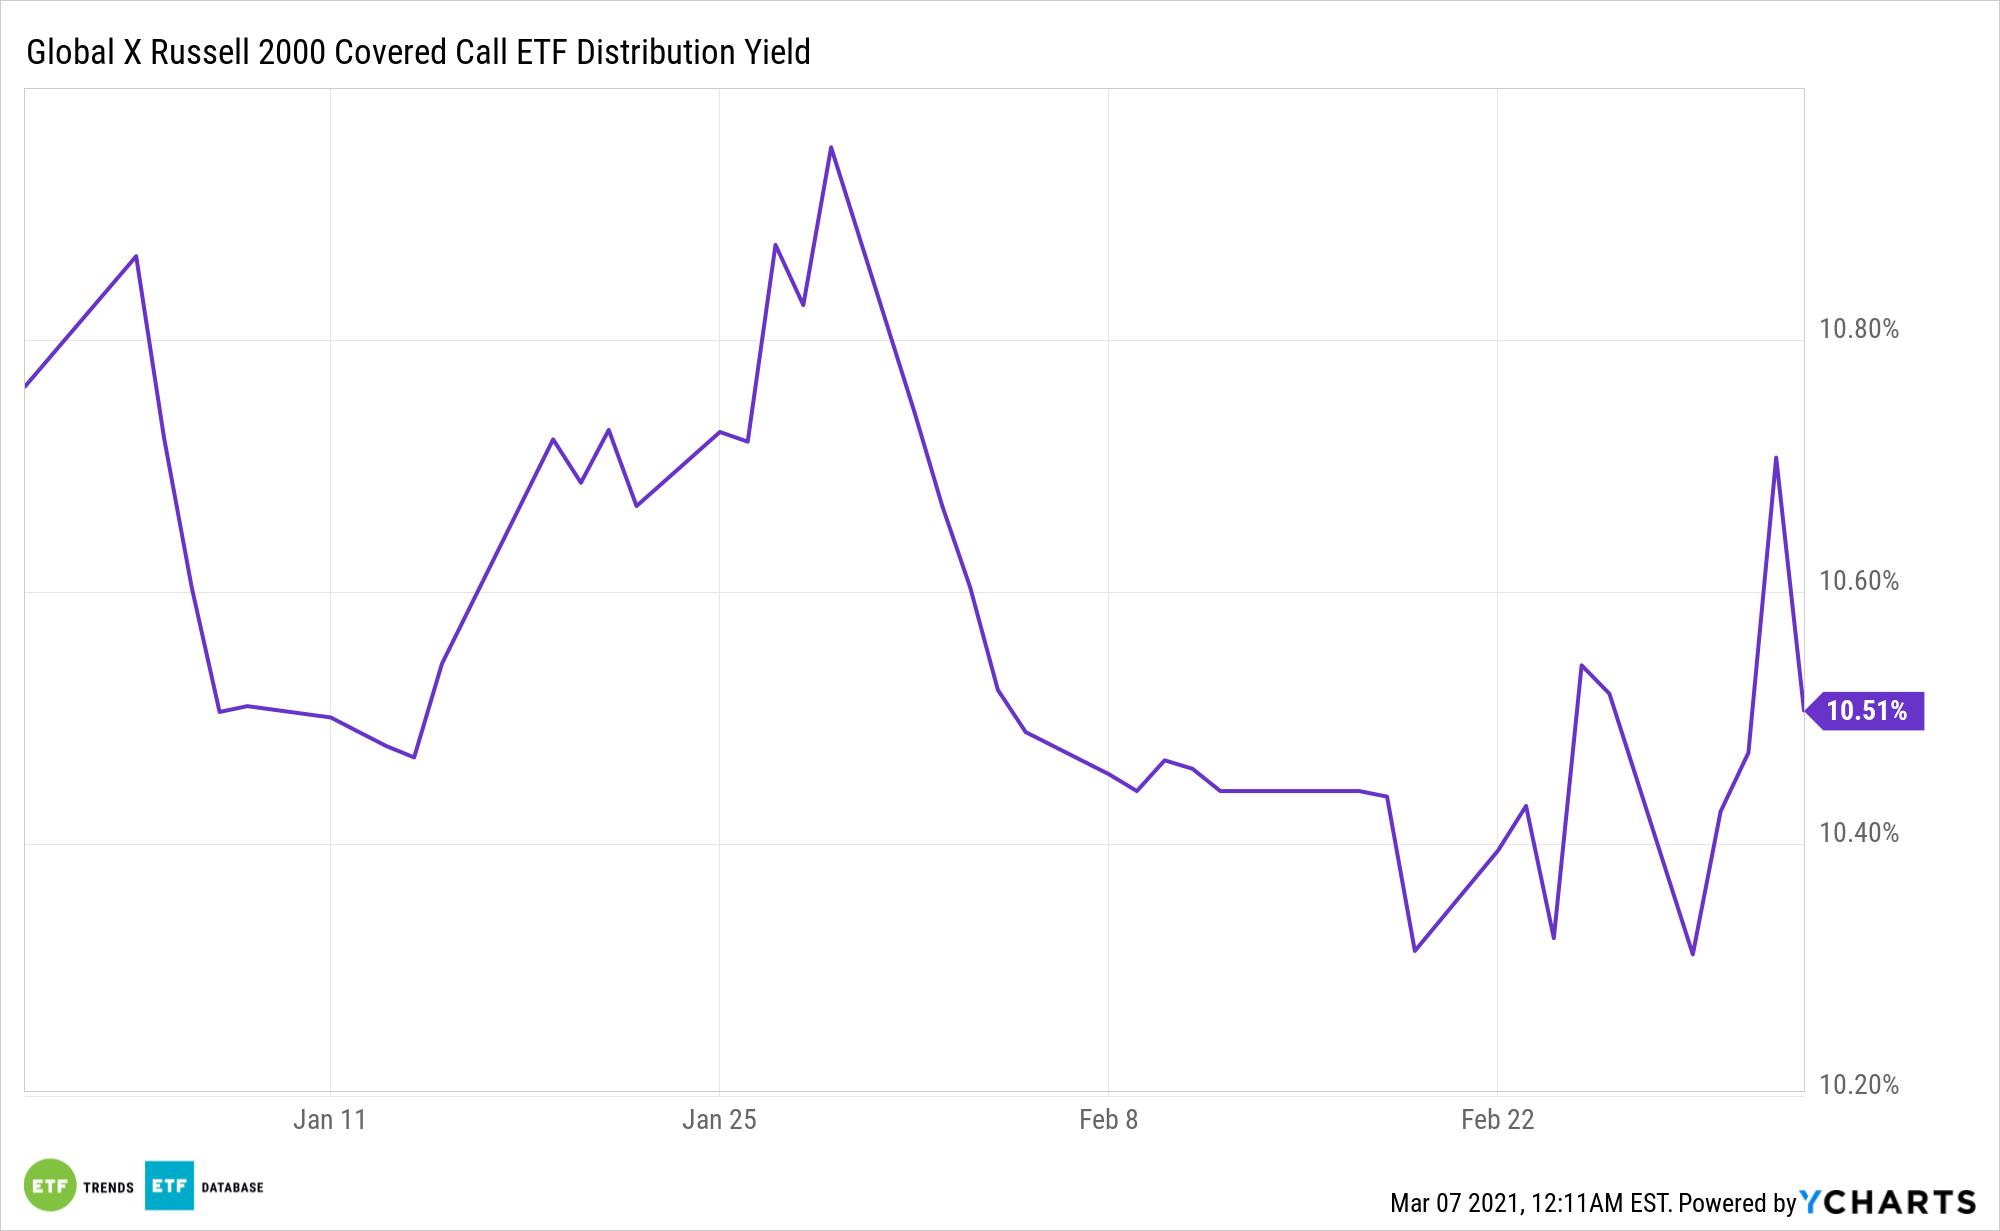 RYLD Distribution Yield Chart